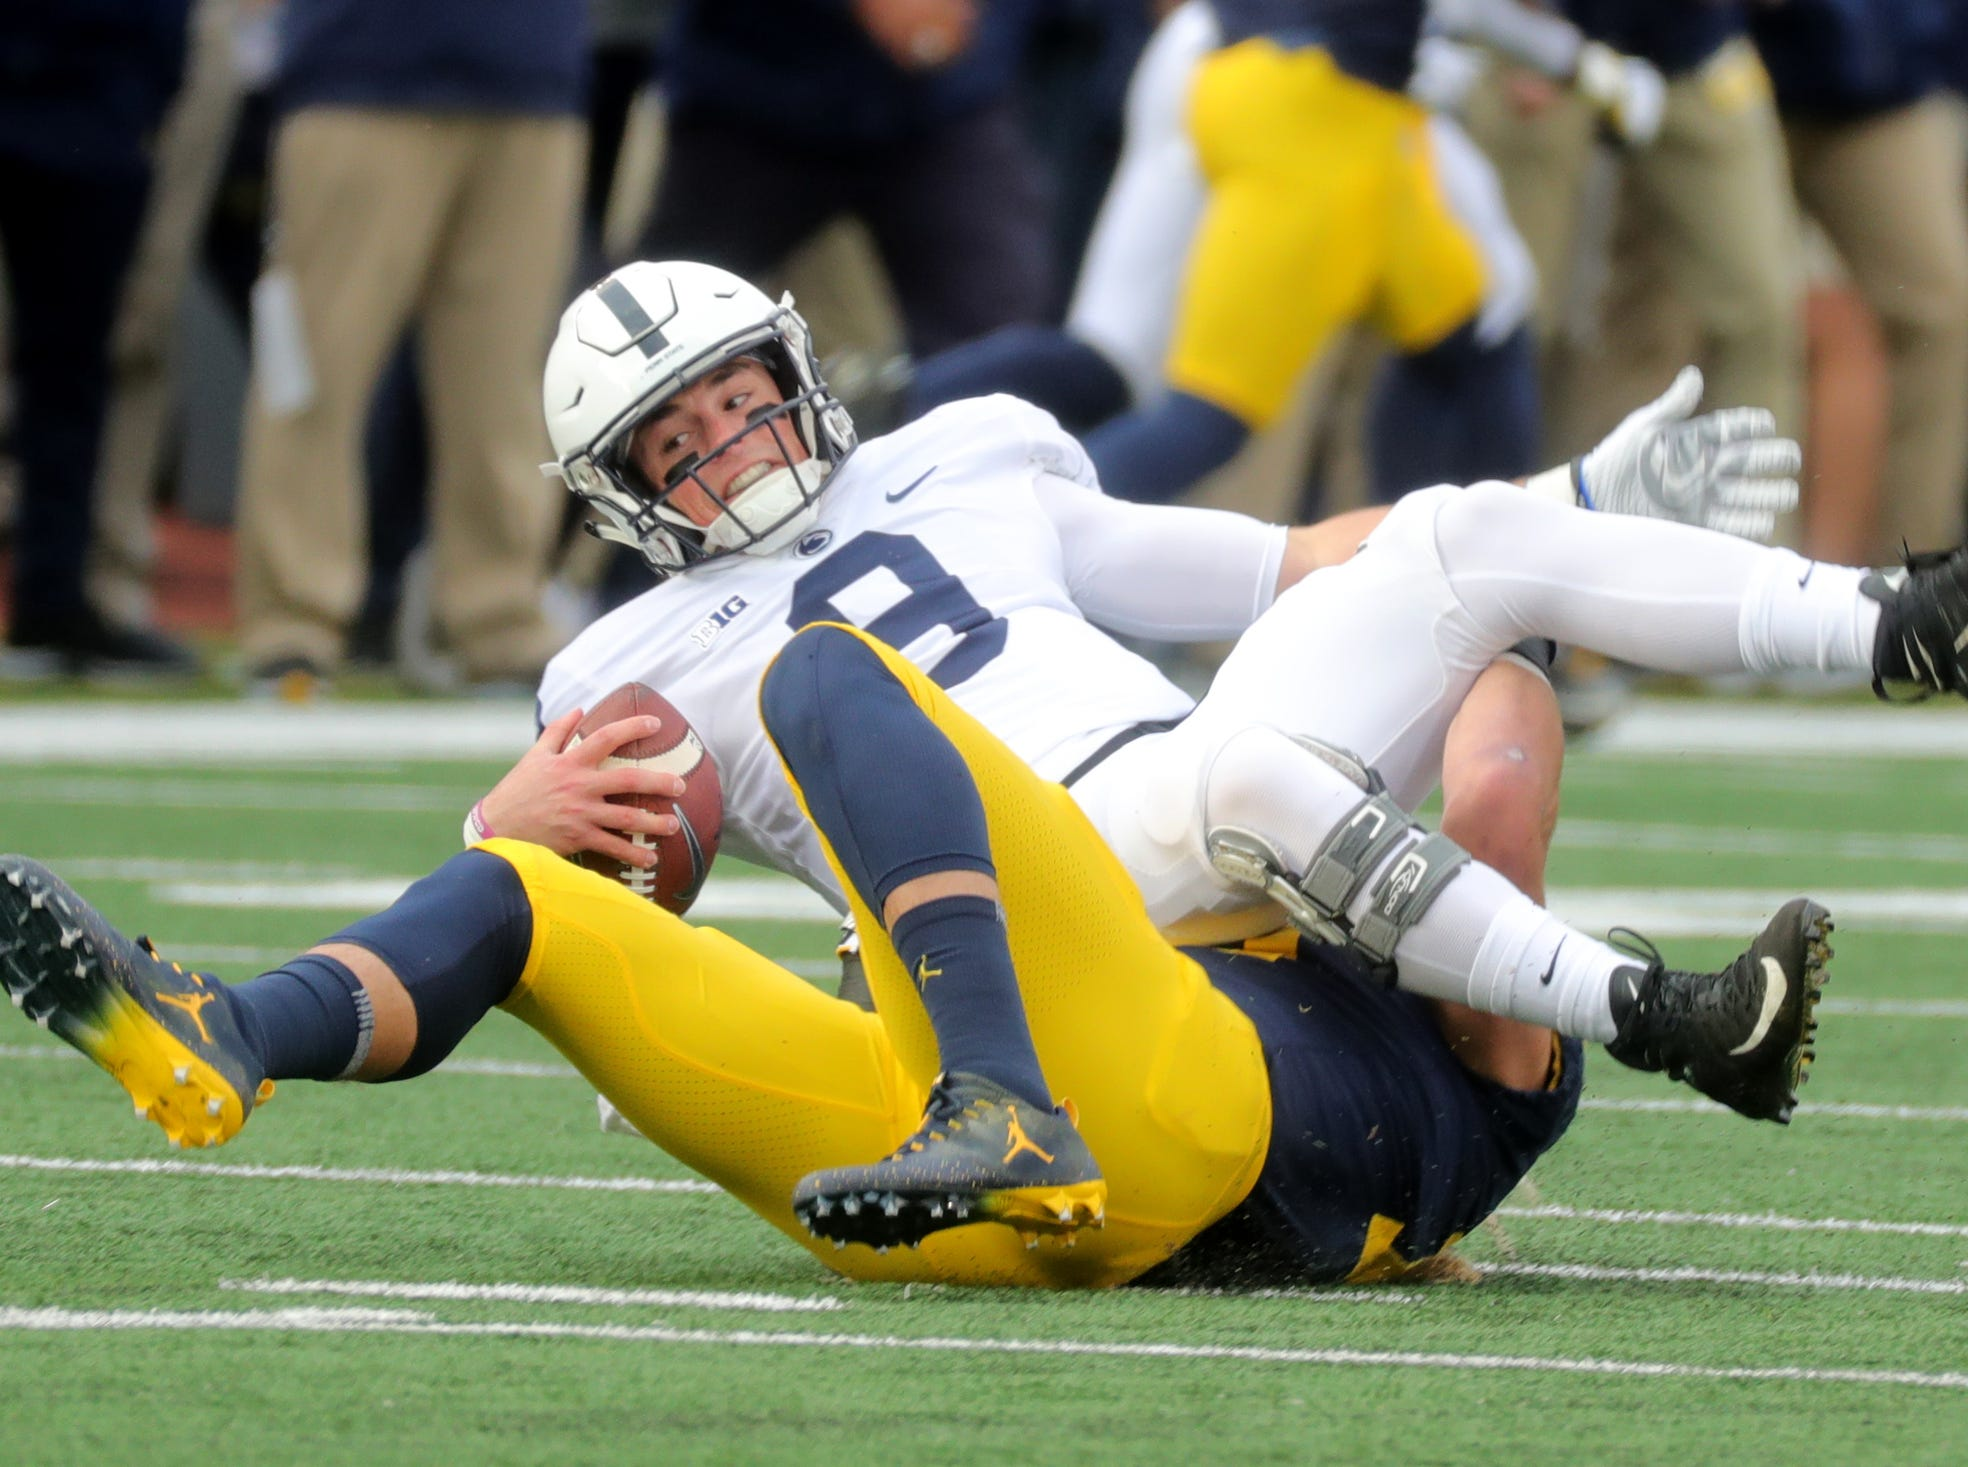 Michigan's Chase Winovich sacks Penn State quarterback Trace McSorley during the first half on Saturday, Nov. 3, 2018 at Michigan Stadium.